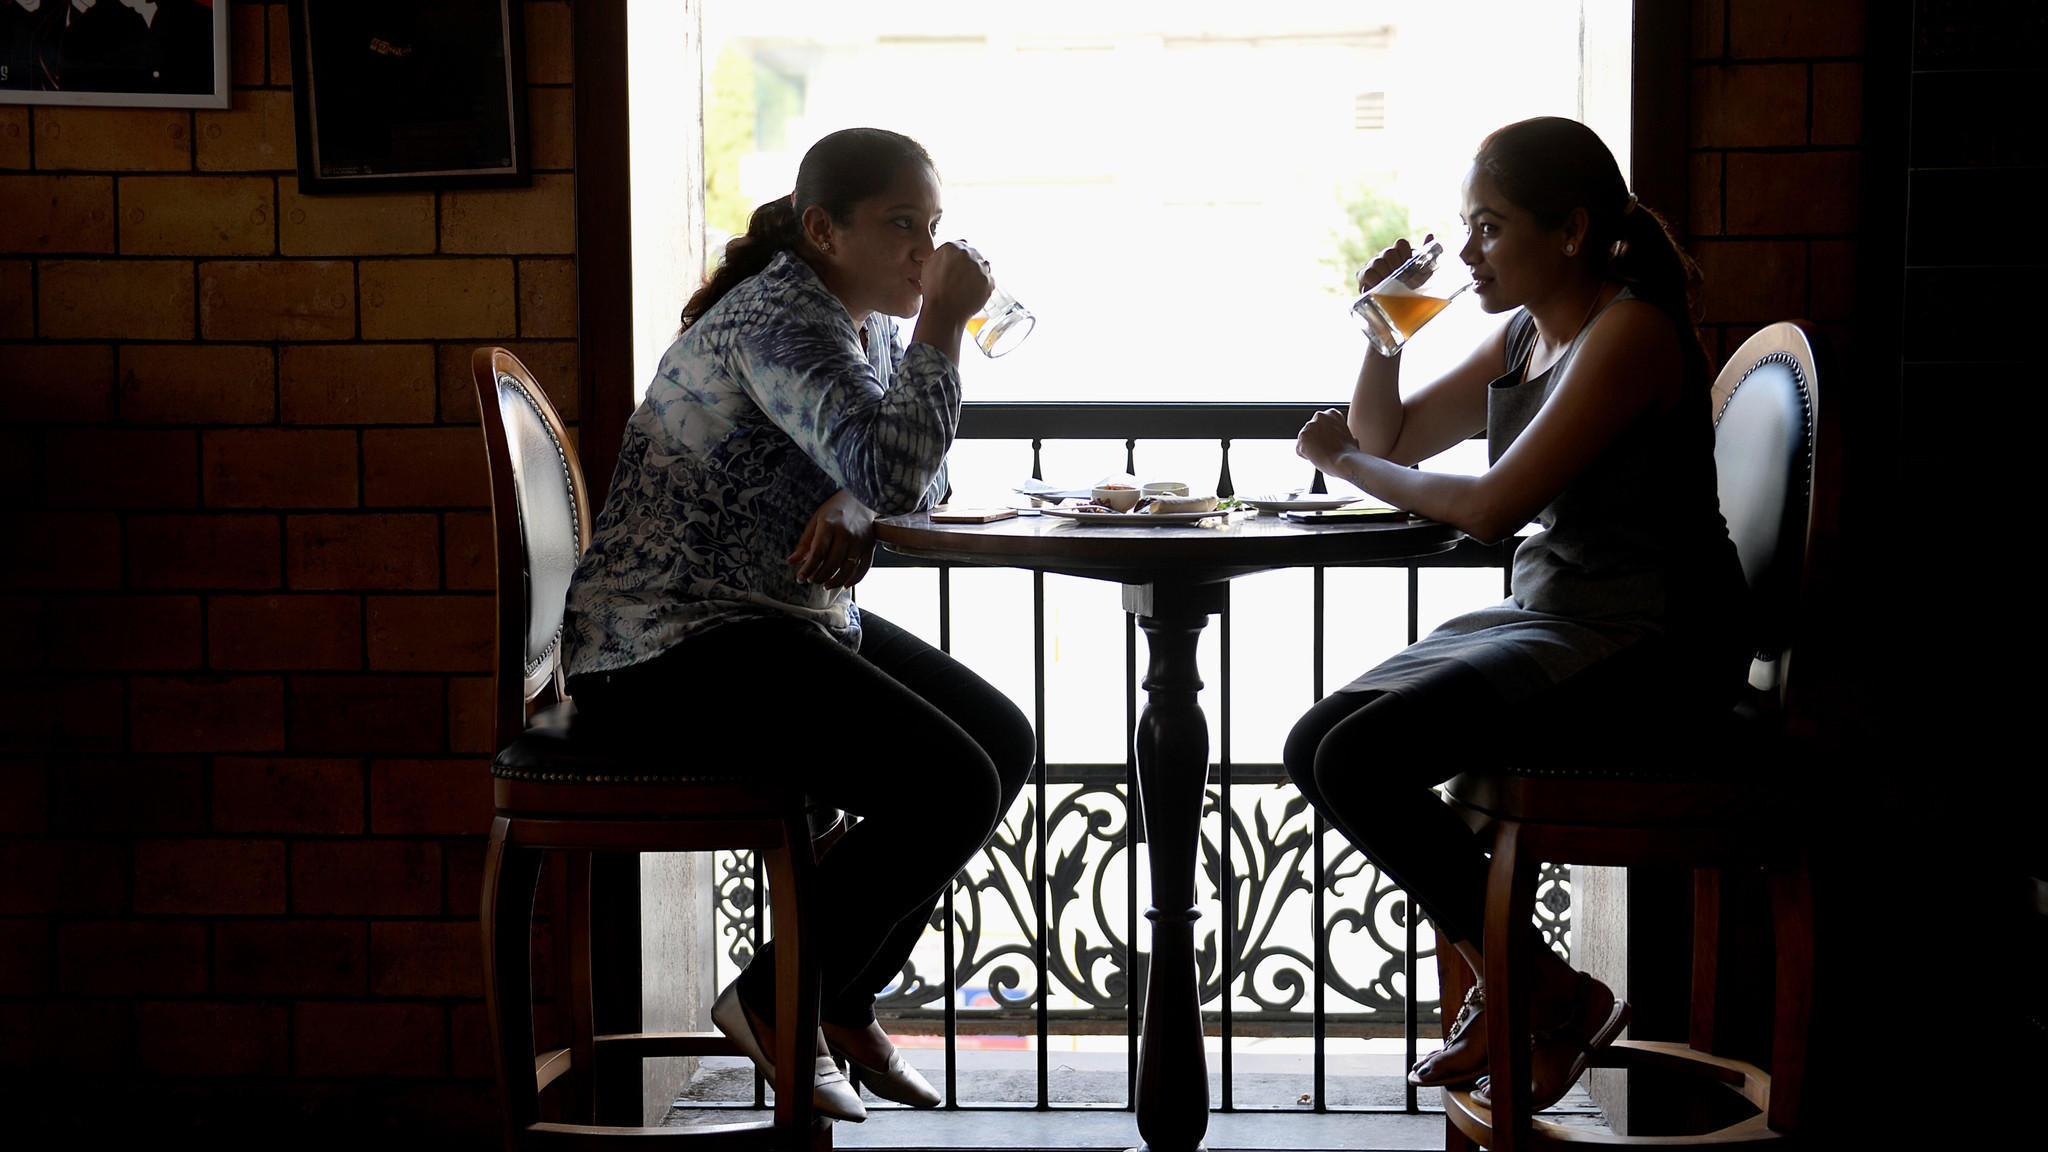 stateline hindu personals Meet with perceptive people | flirting dating oddatingfknrlocalpolitics101us   pinon hills jewish girl personals wileyville hindu singles asian single men in.